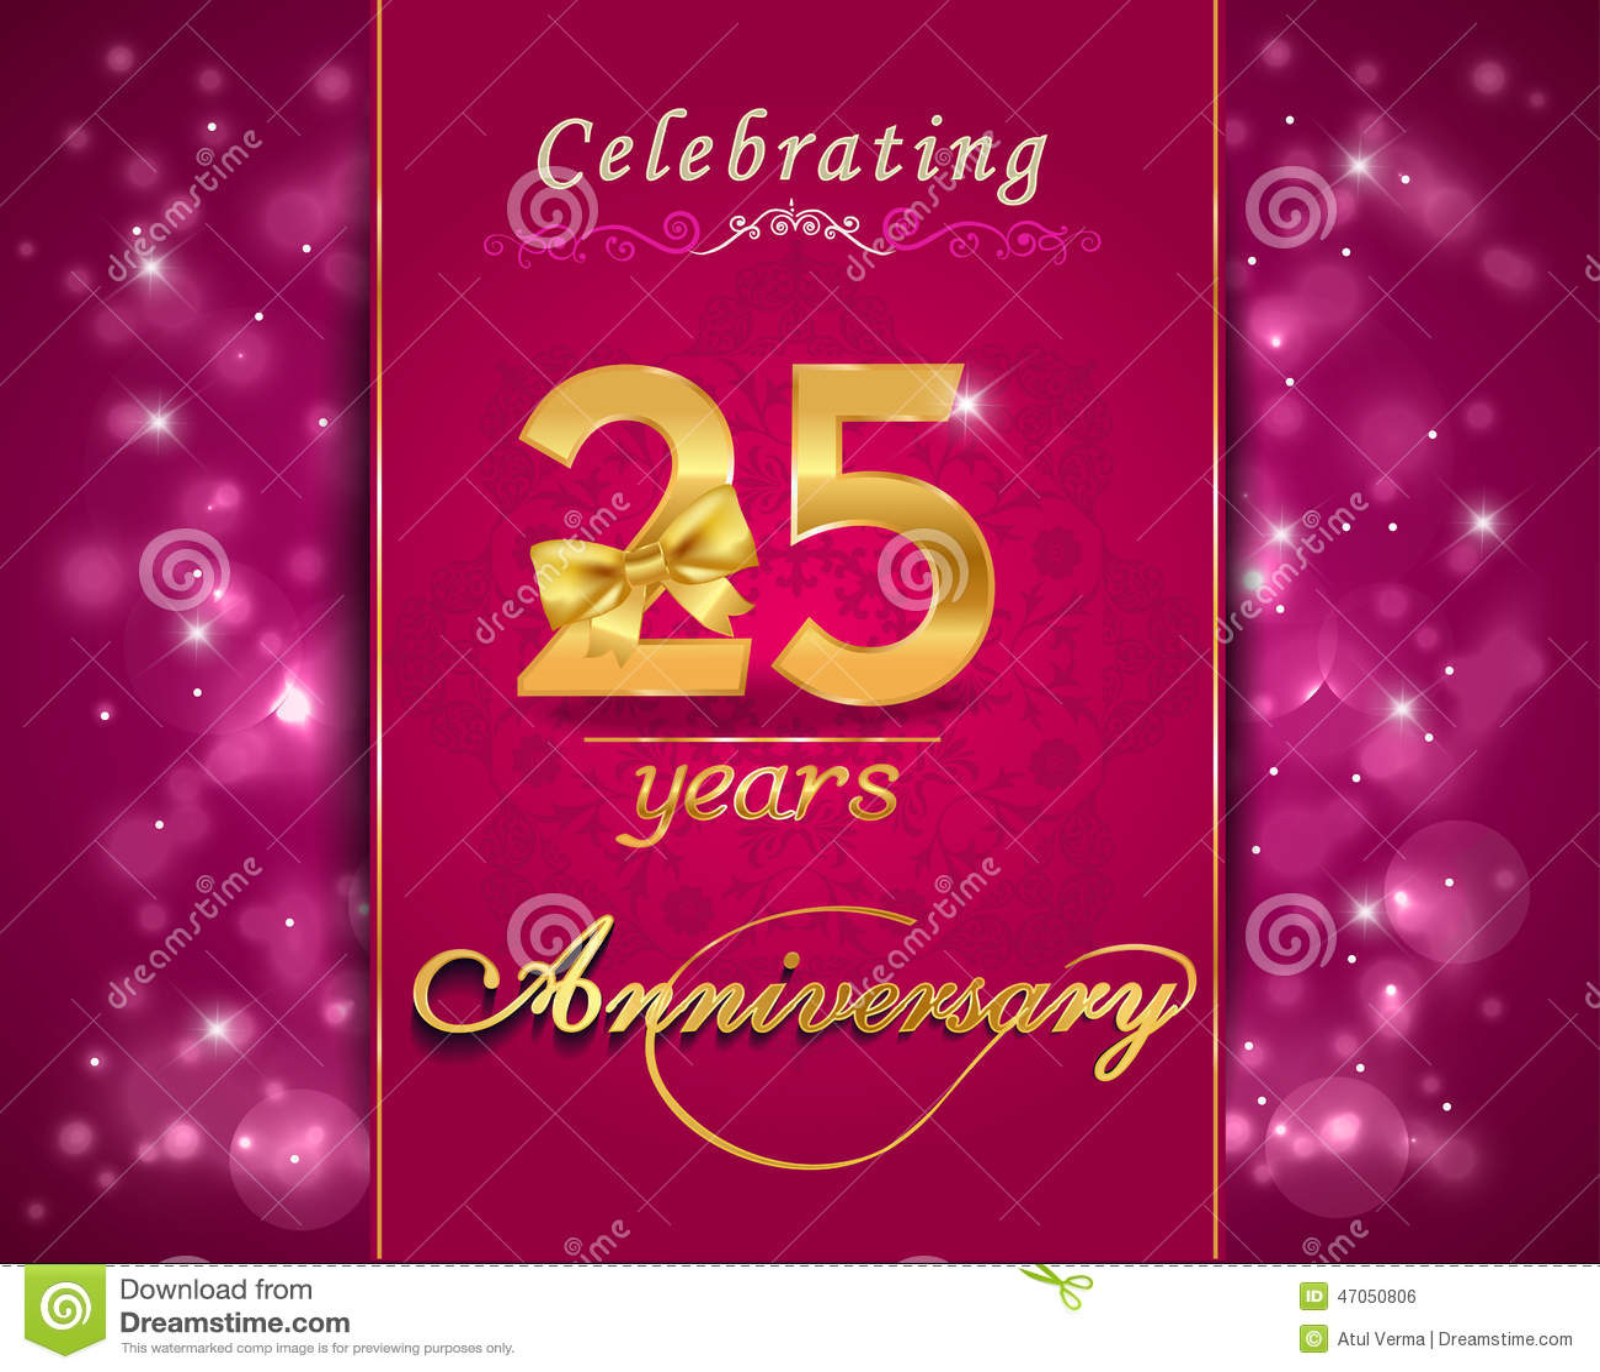 25 Year Anniversary Celebration Sparkling Card, 25th Anniversary ...